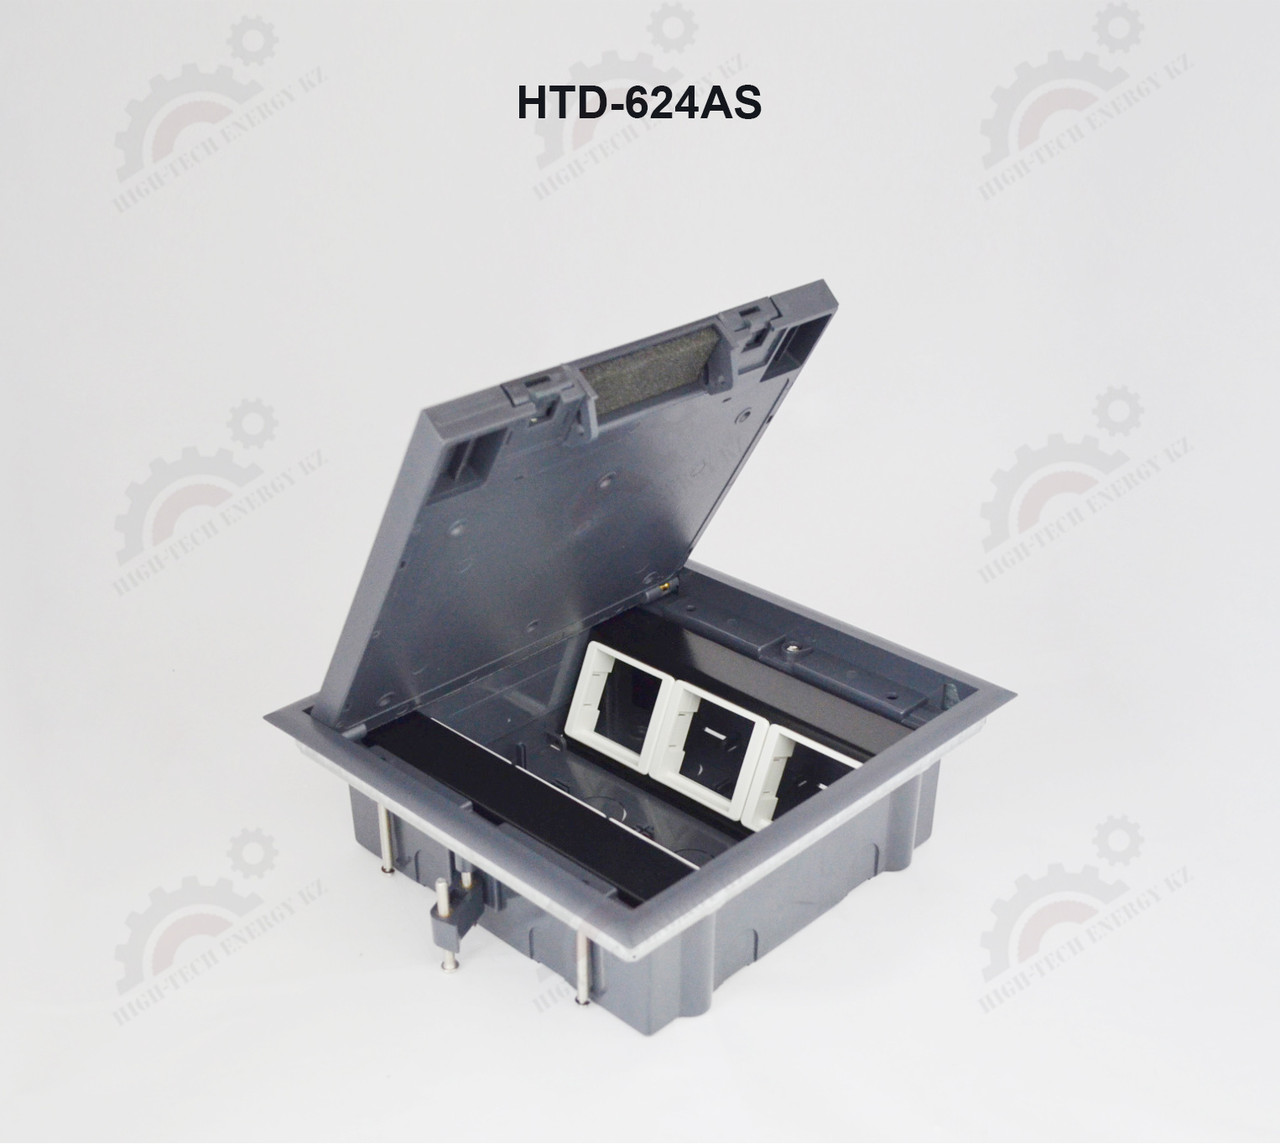 FEILIFU HTD-624AS Напольный лючок на 6 модулей, пластик, цвет серый